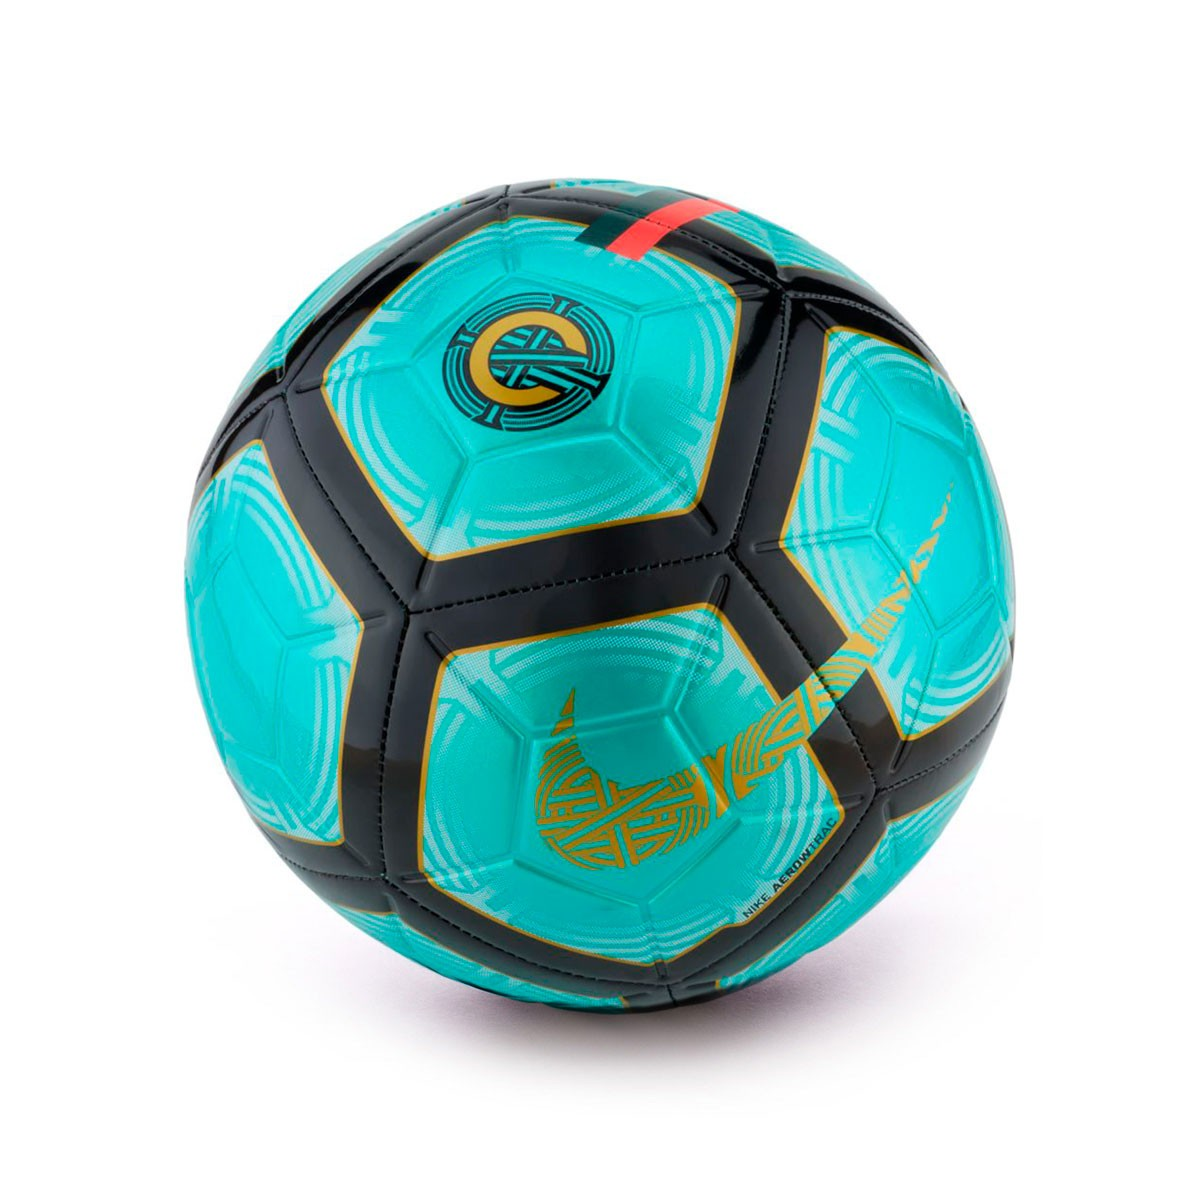 Bola de Futebol Nike Strike CR7 Clear emerald-Black-Gold - Loja de ... d0a1d93d06dff